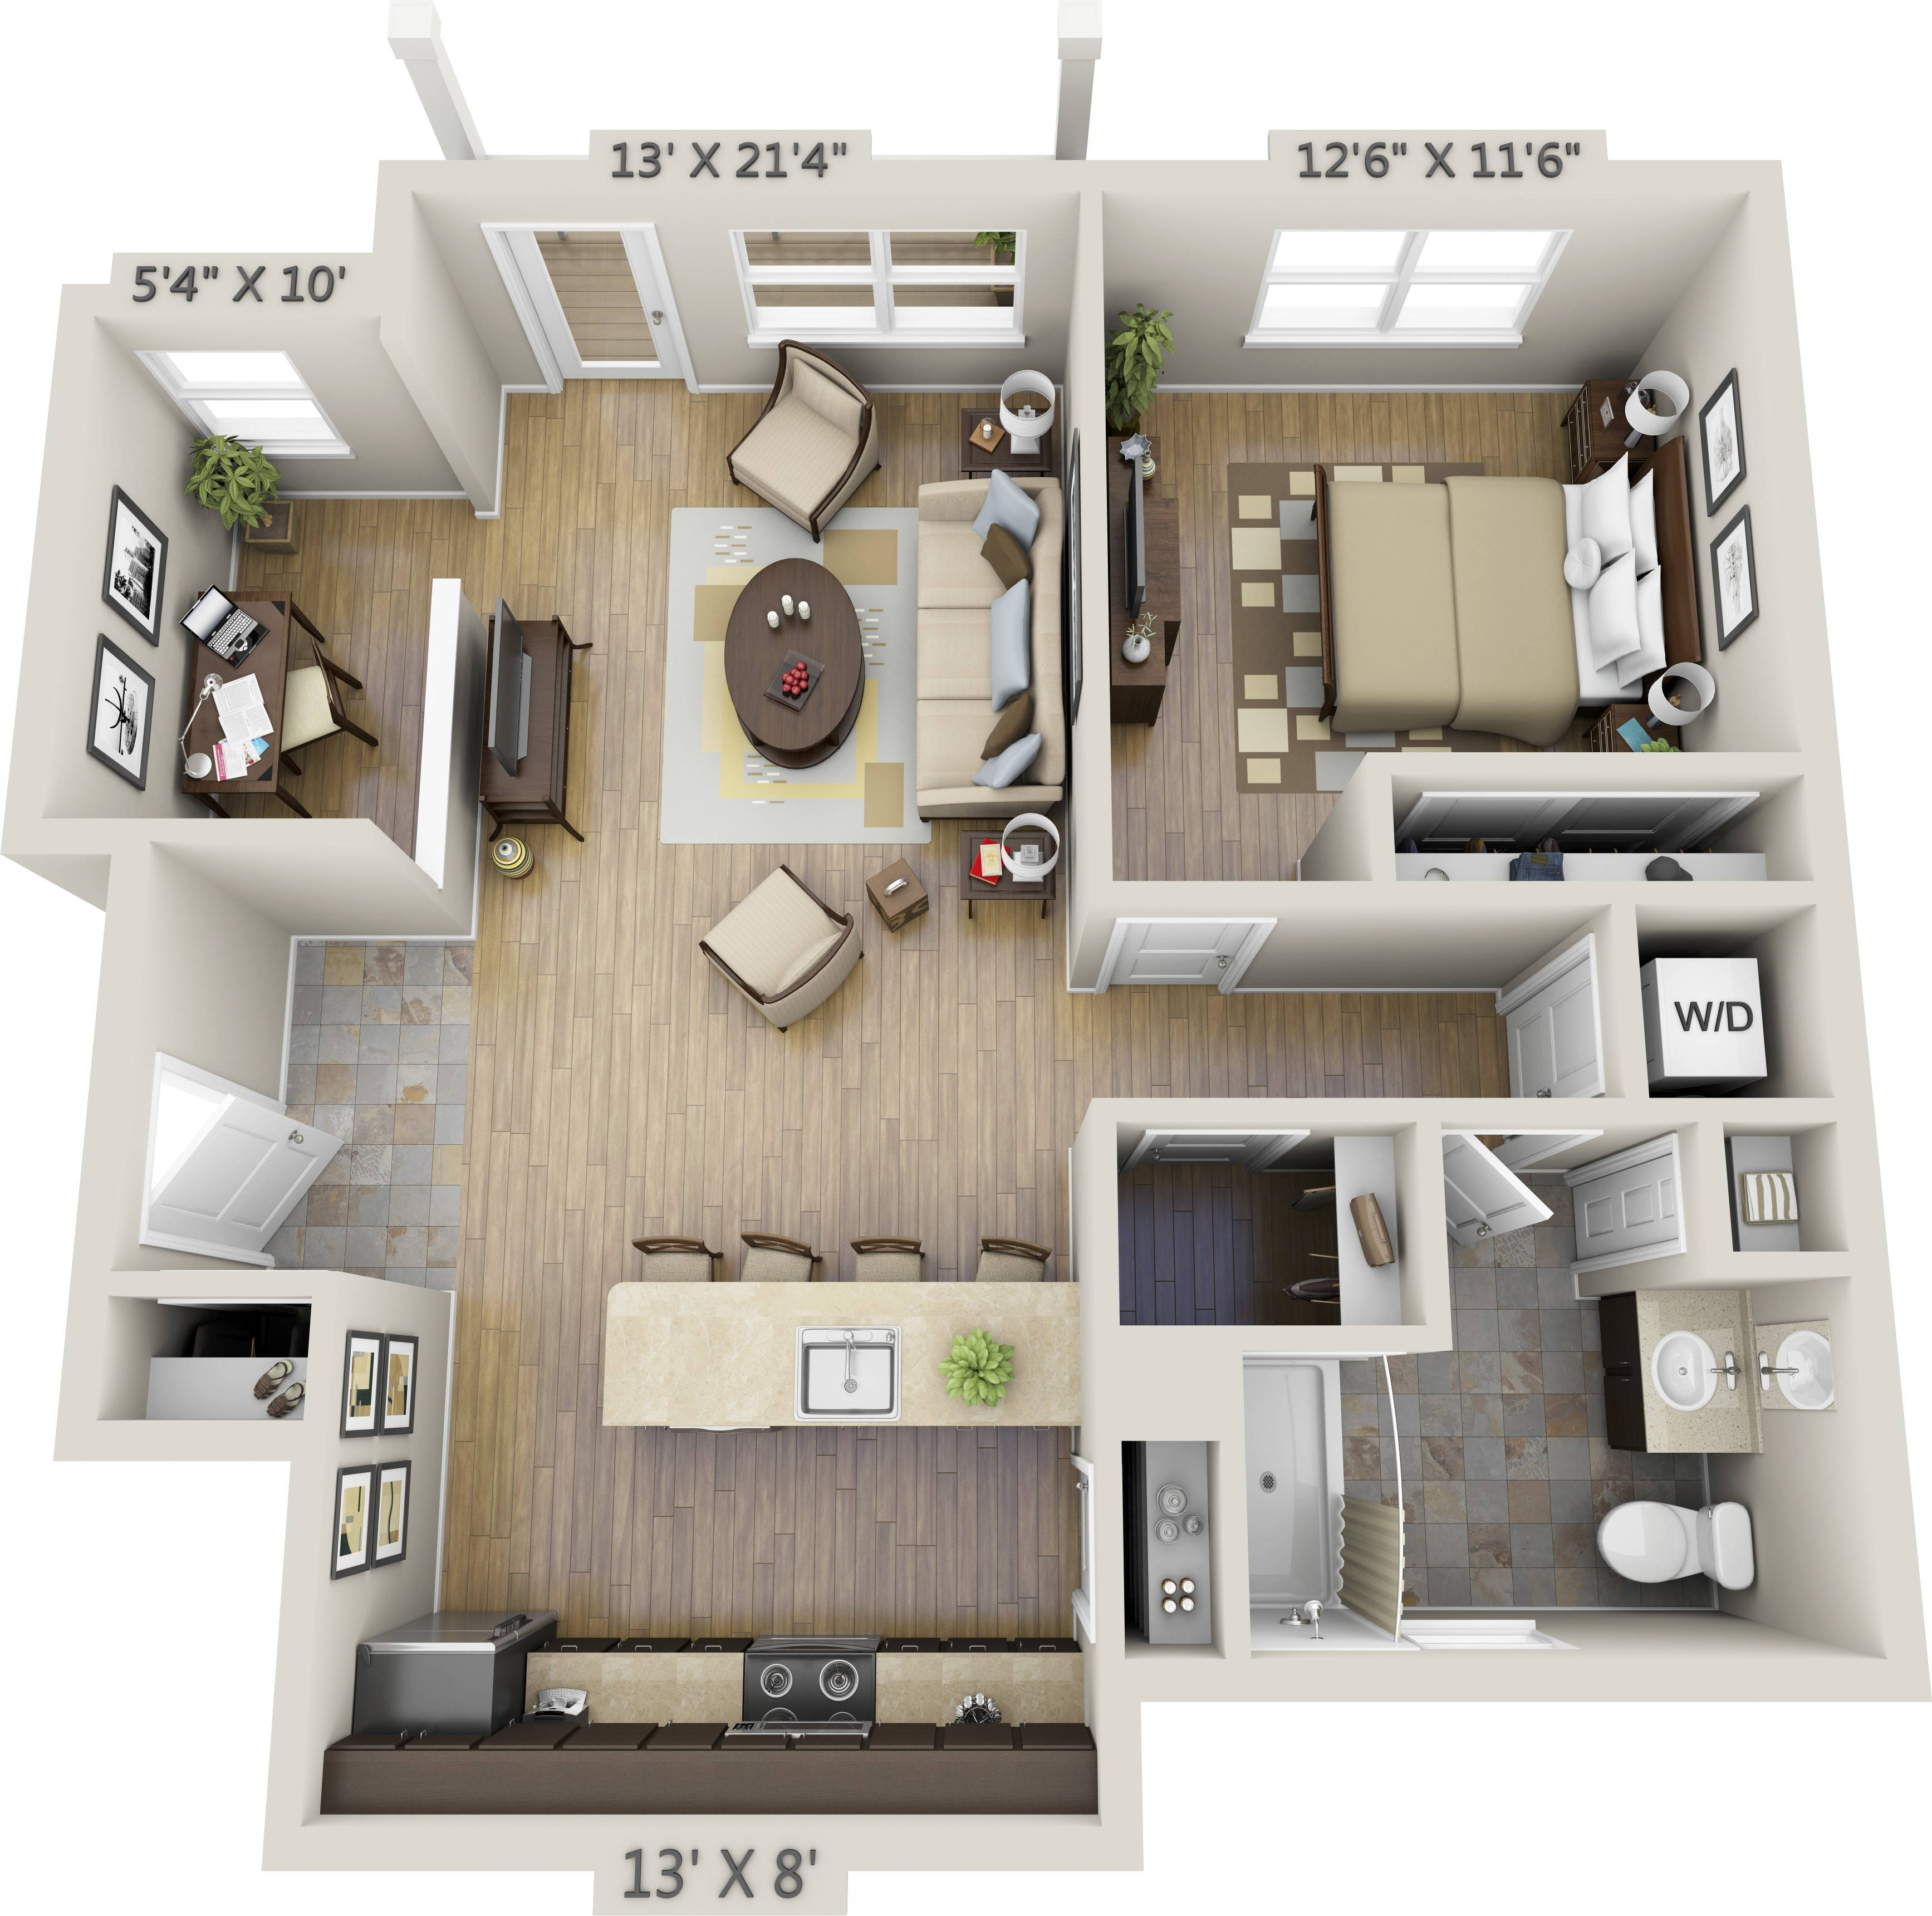 Large Bedroom Apartment Floor Plans Best One House Plans 121393